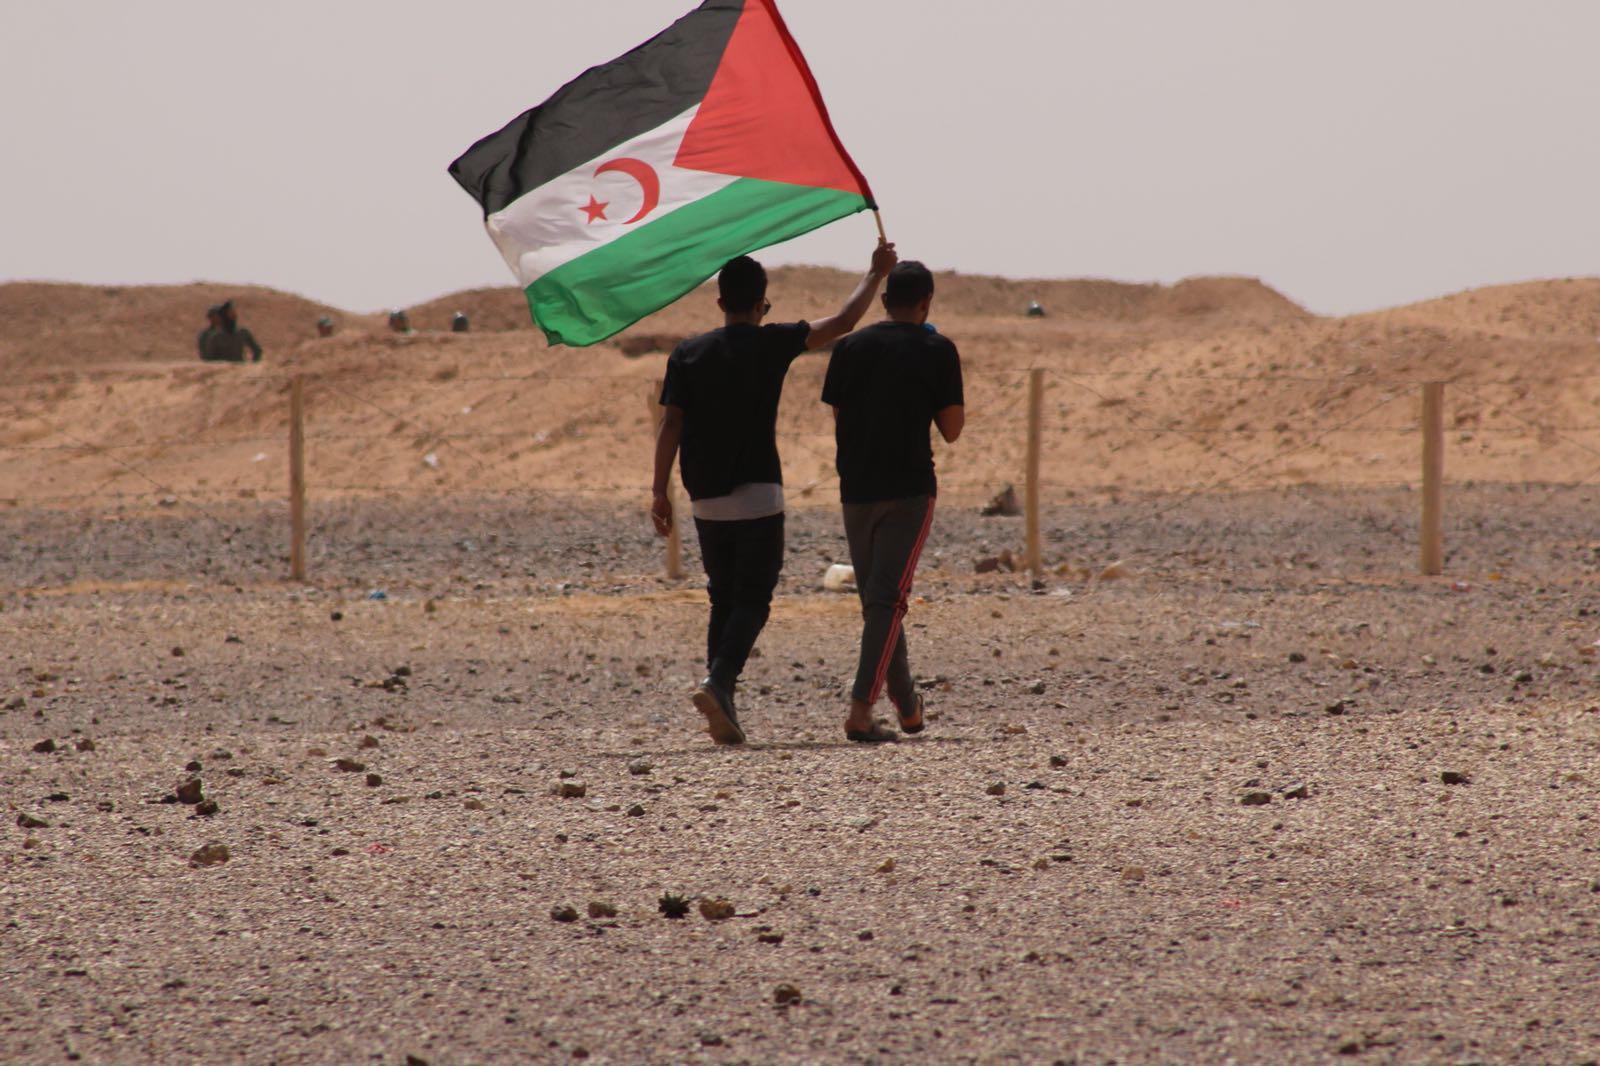 Sahara Occidentale, Rinnovo Mandato Onu Frena La Pace